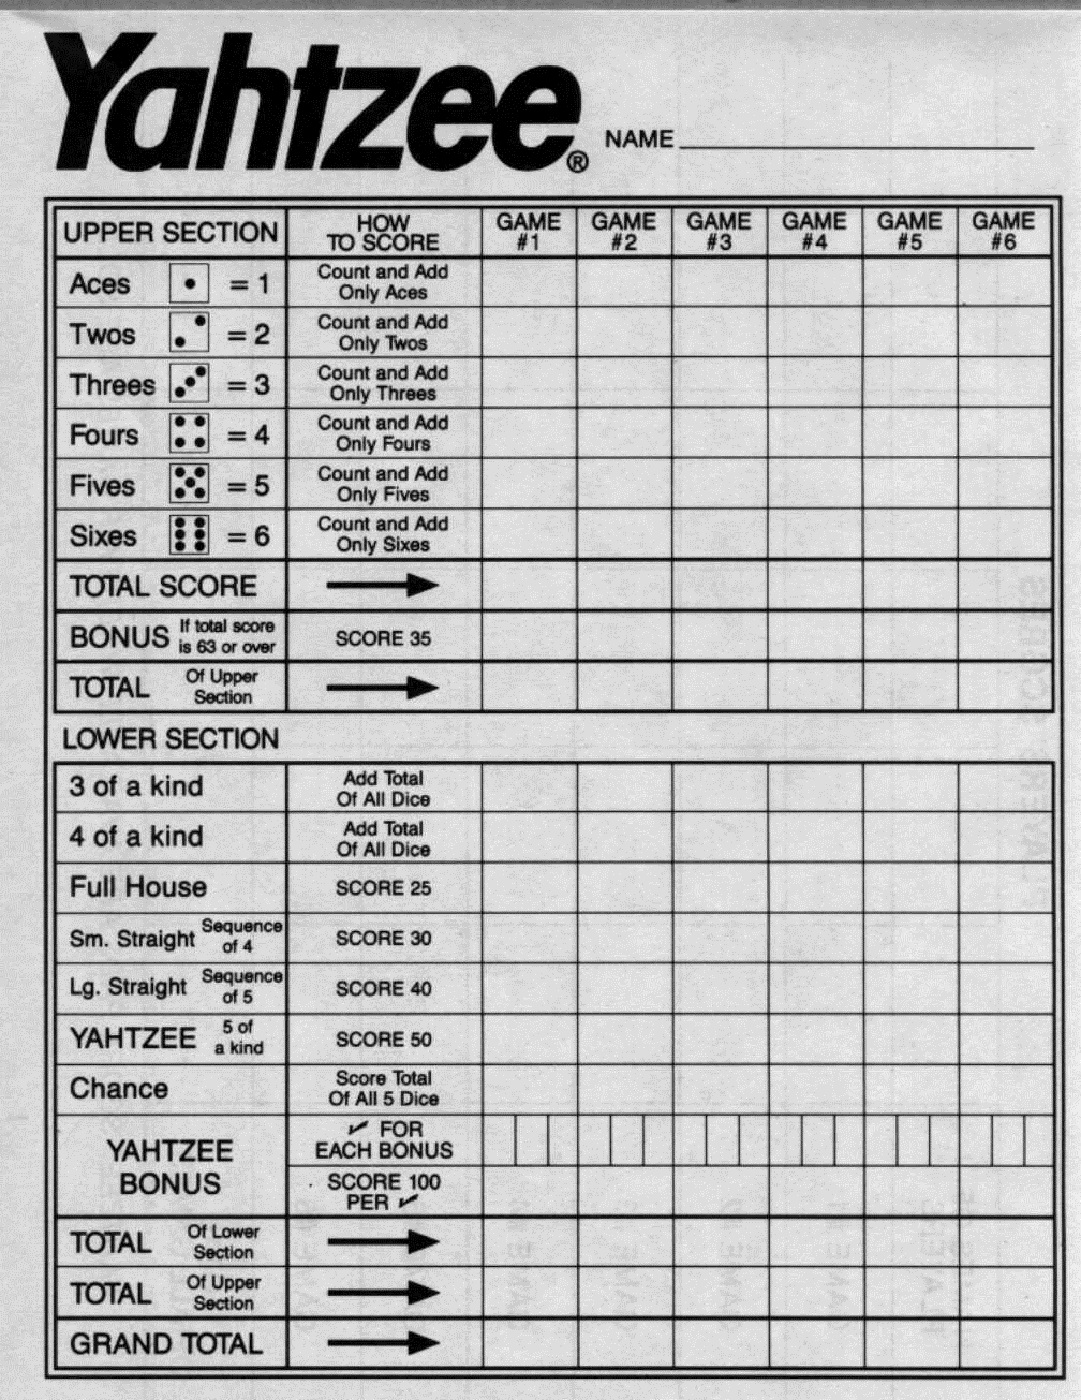 graphic about Printable Yahtzee Score Sheet called Yahtzee Ranking Sheets - Resume Illustrations Resume Template